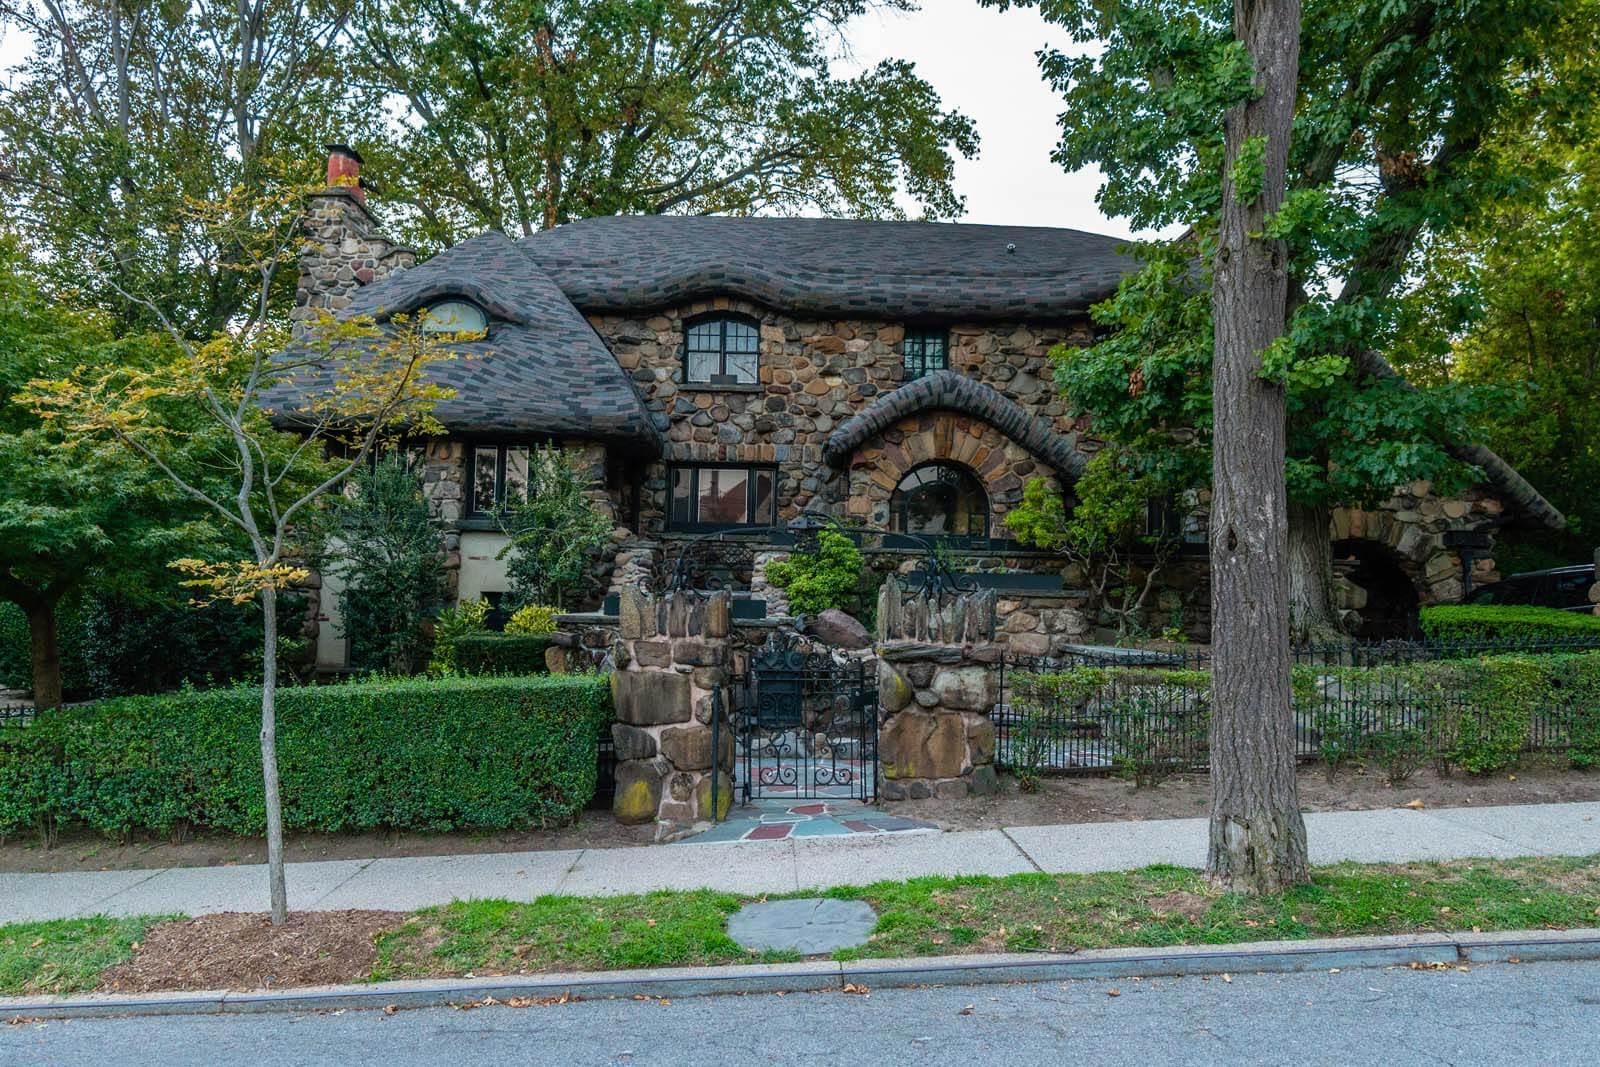 Gingerbread house of Bay Ridge Brooklyn